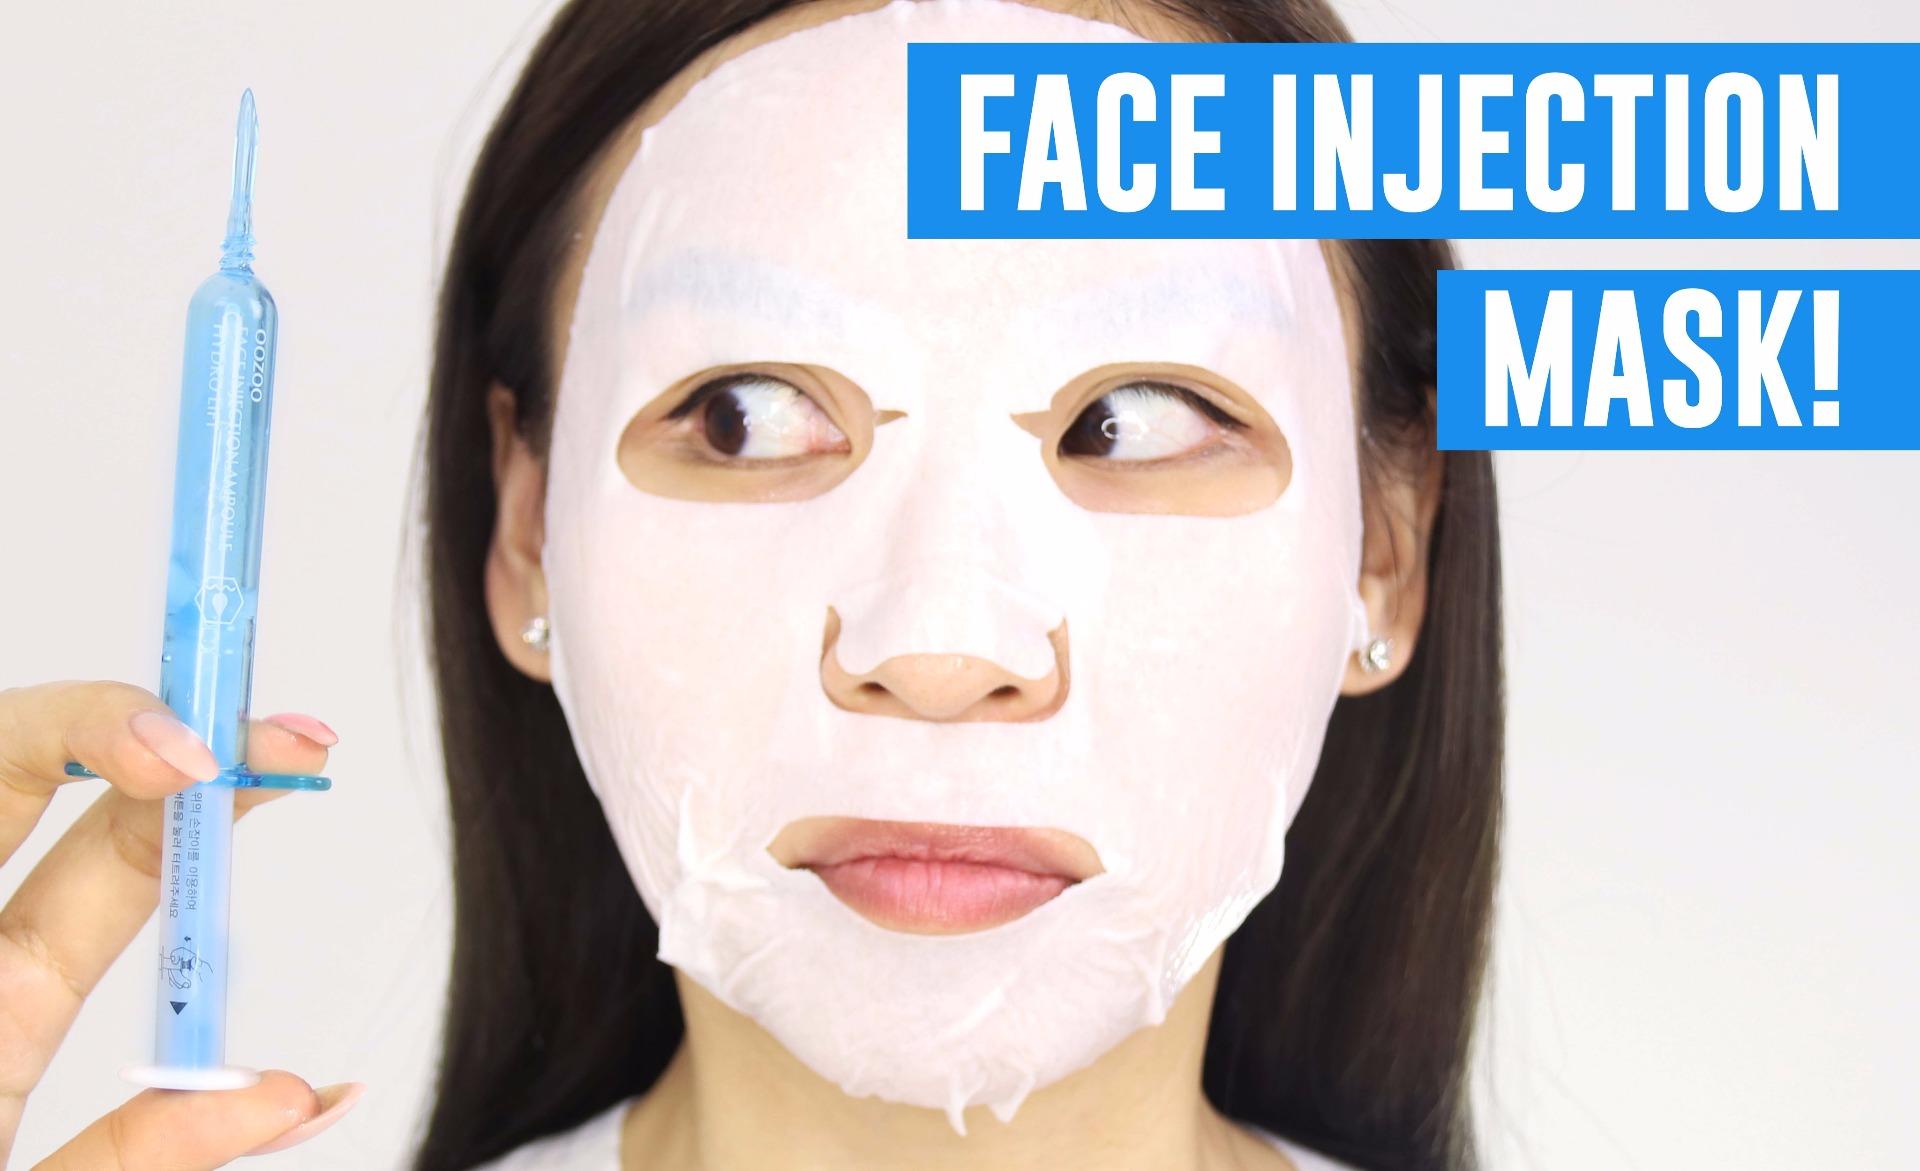 Mặt Nạ Làm Trắng Da Face In-shot Mask Entensive White